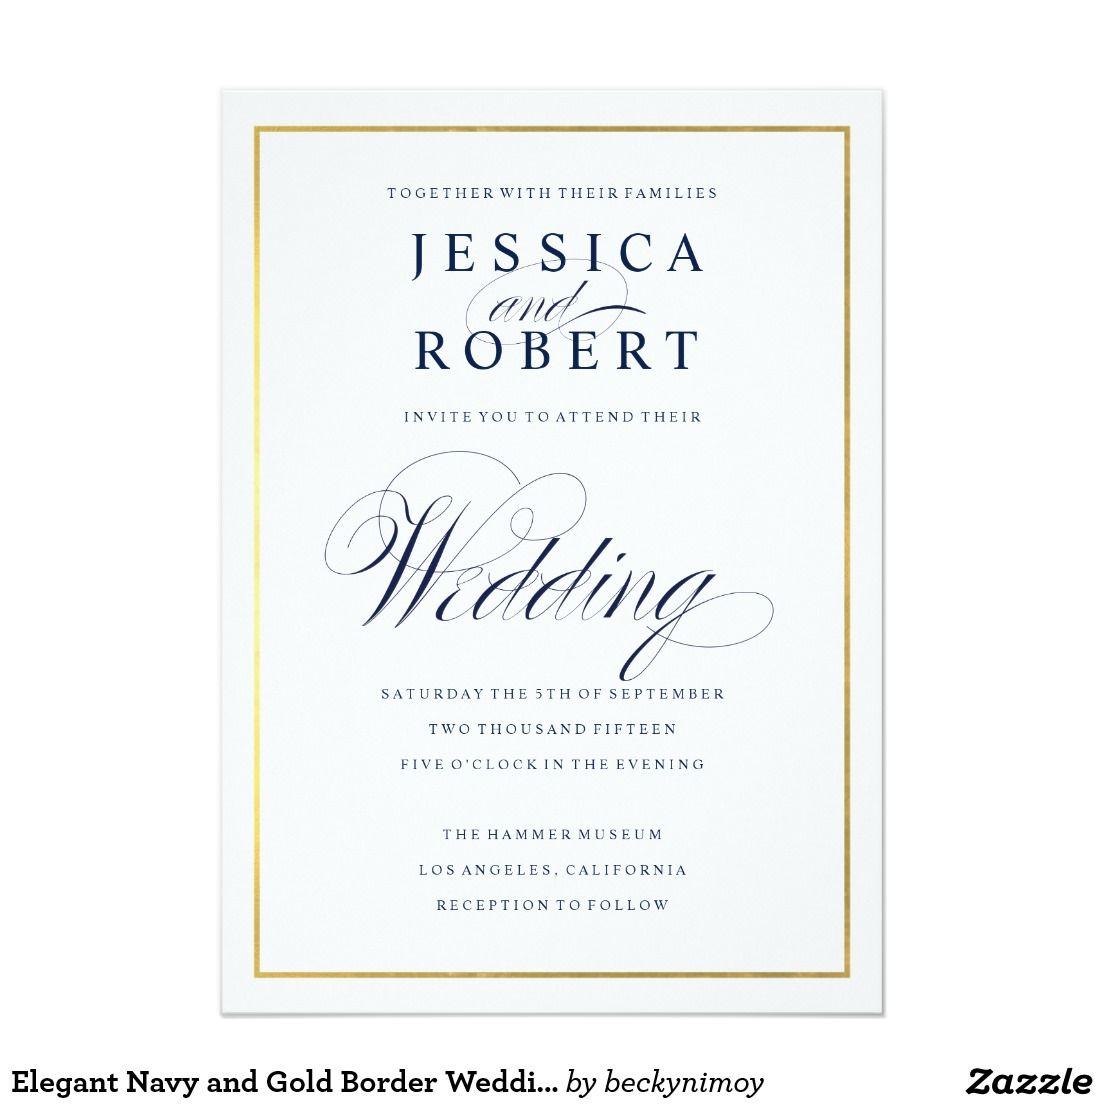 Elegant Dark Navy Faux Gold Border Wedding Invitation | Pinterest ...